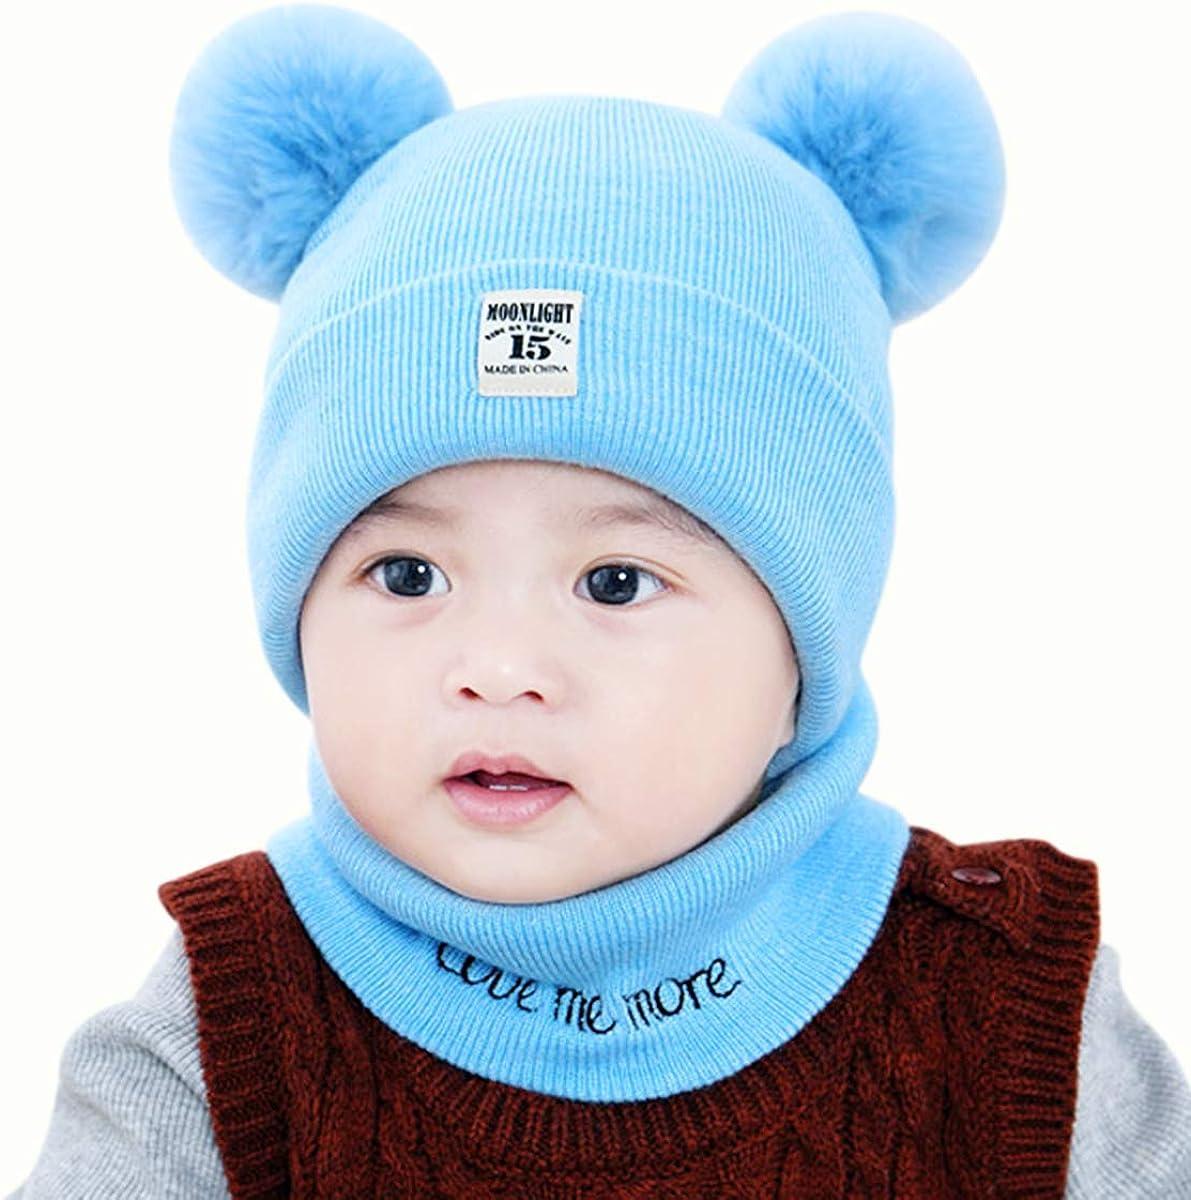 2PCS Kids Hat Scarf Set Toddler Girl Baby Boy OFFicial shop Winter Infant Now on sale Croc